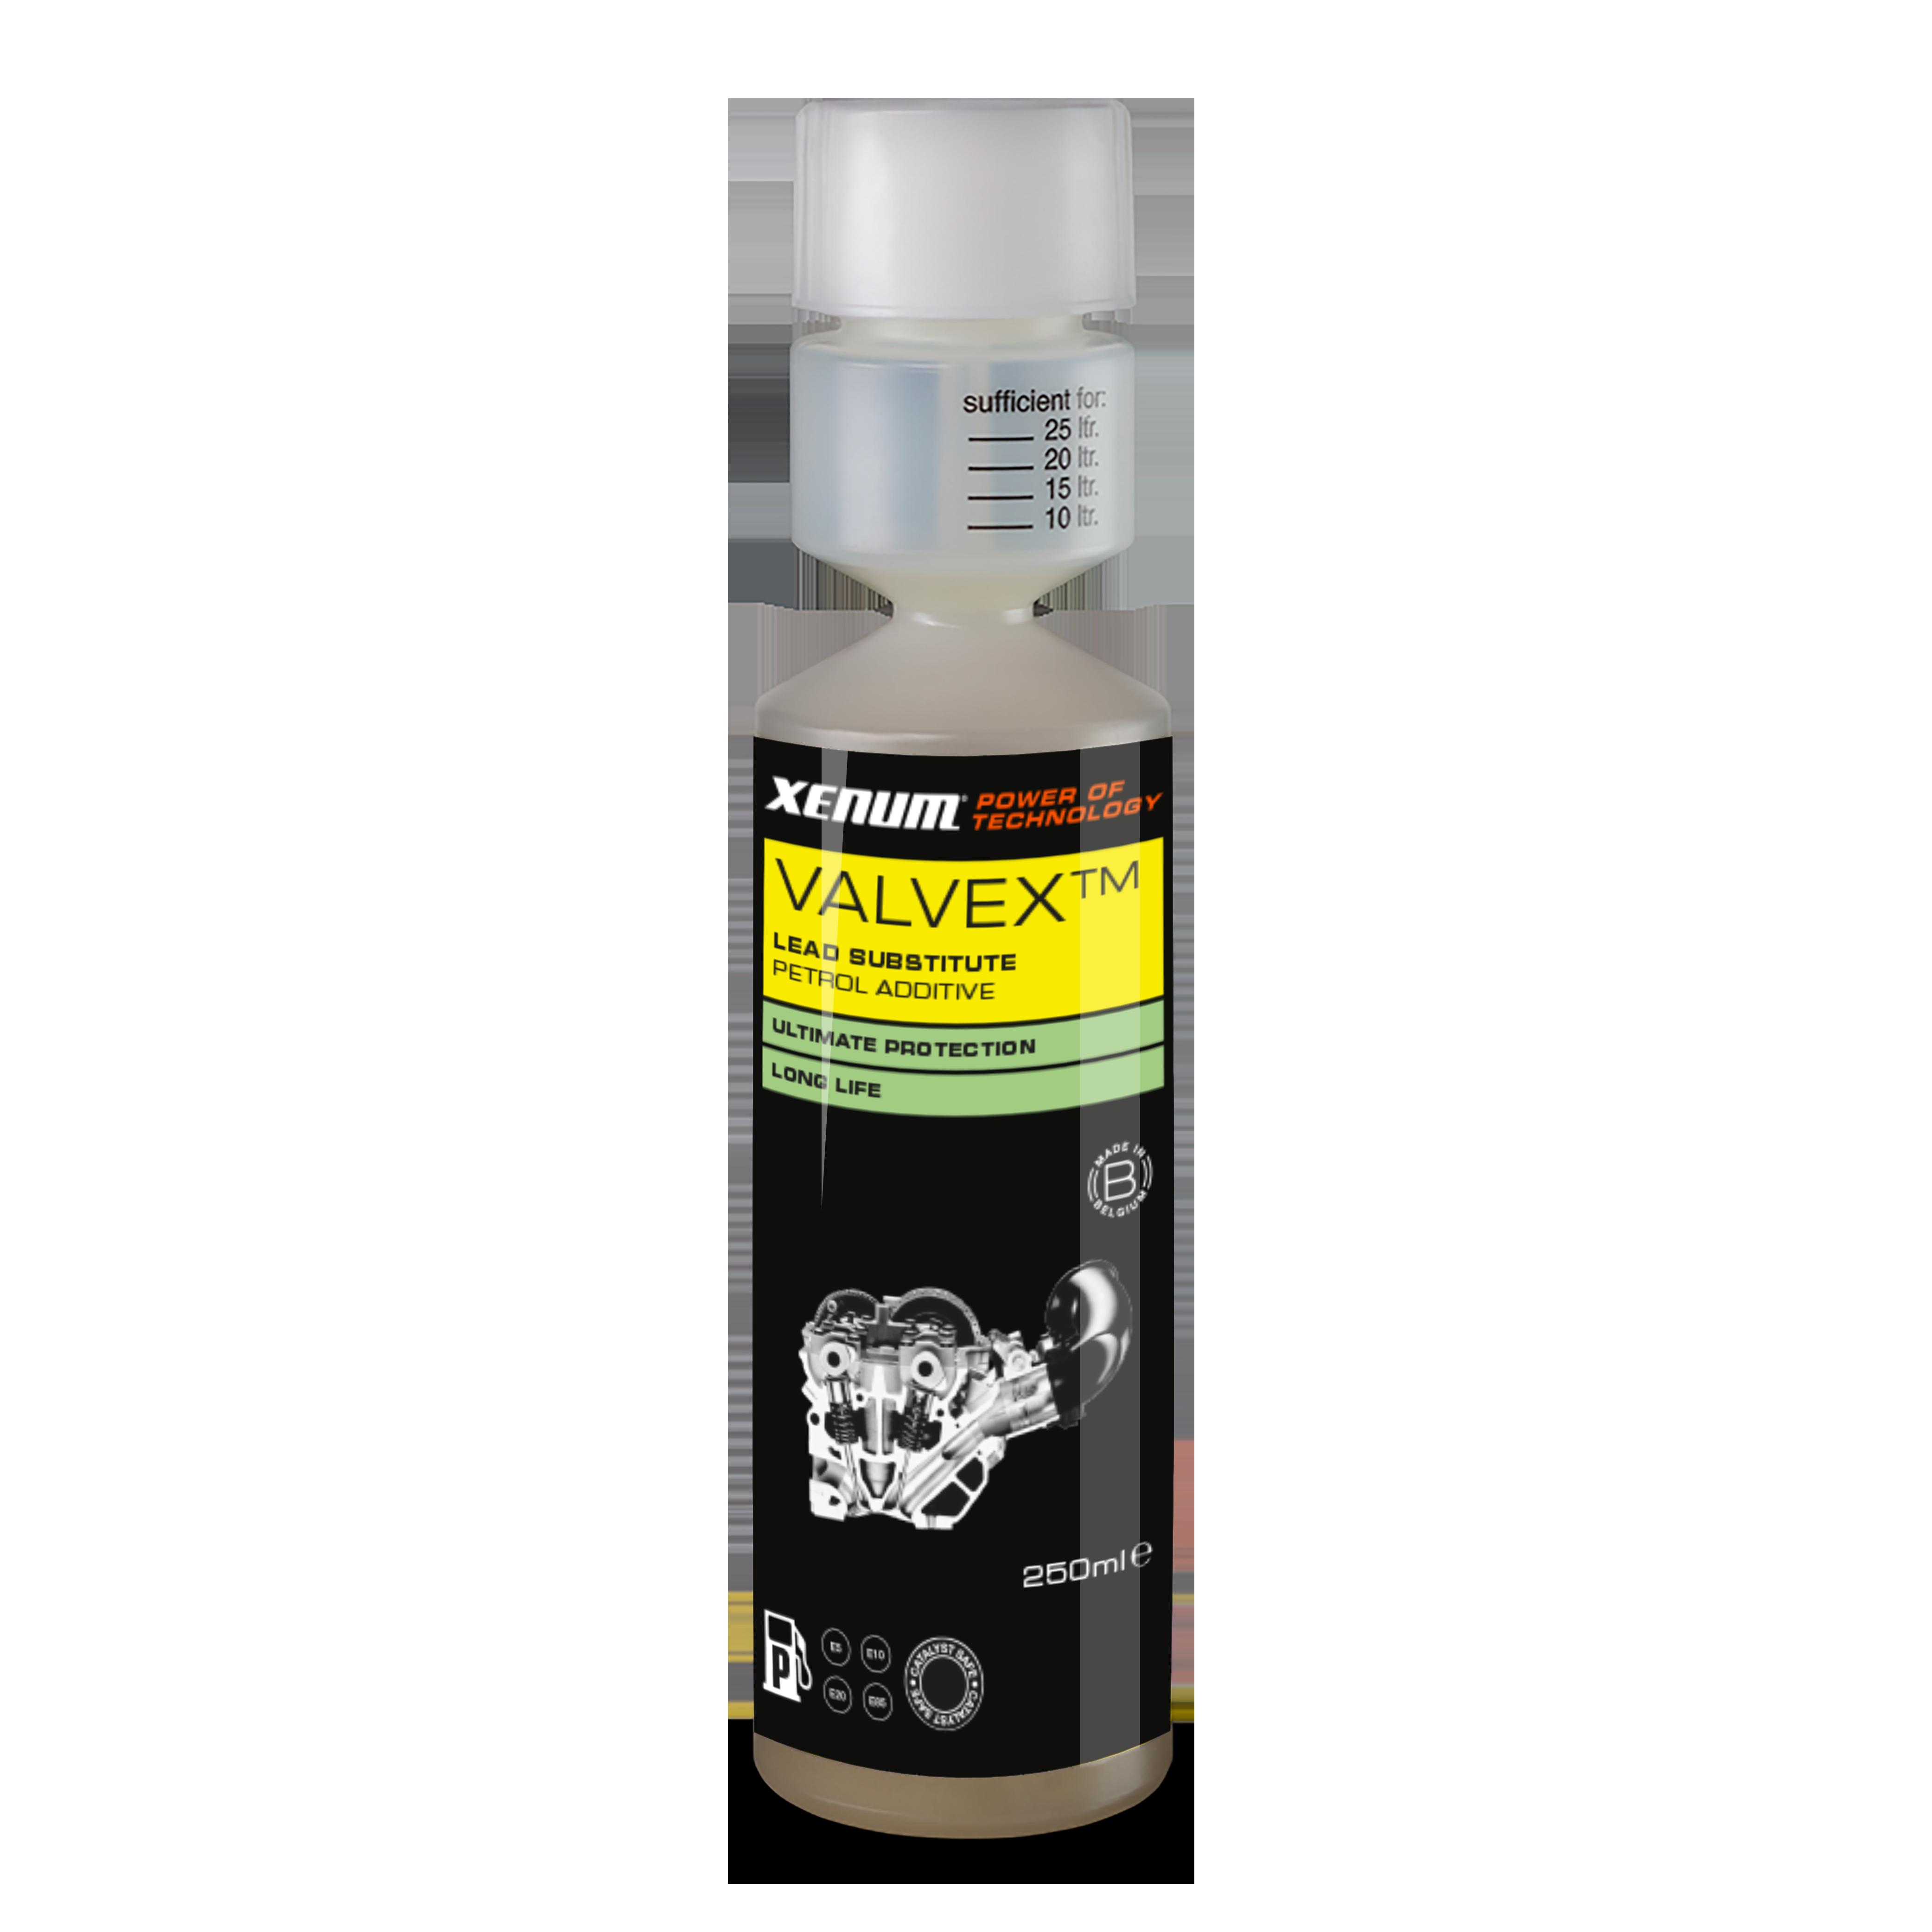 Valvex - 250ml bottle